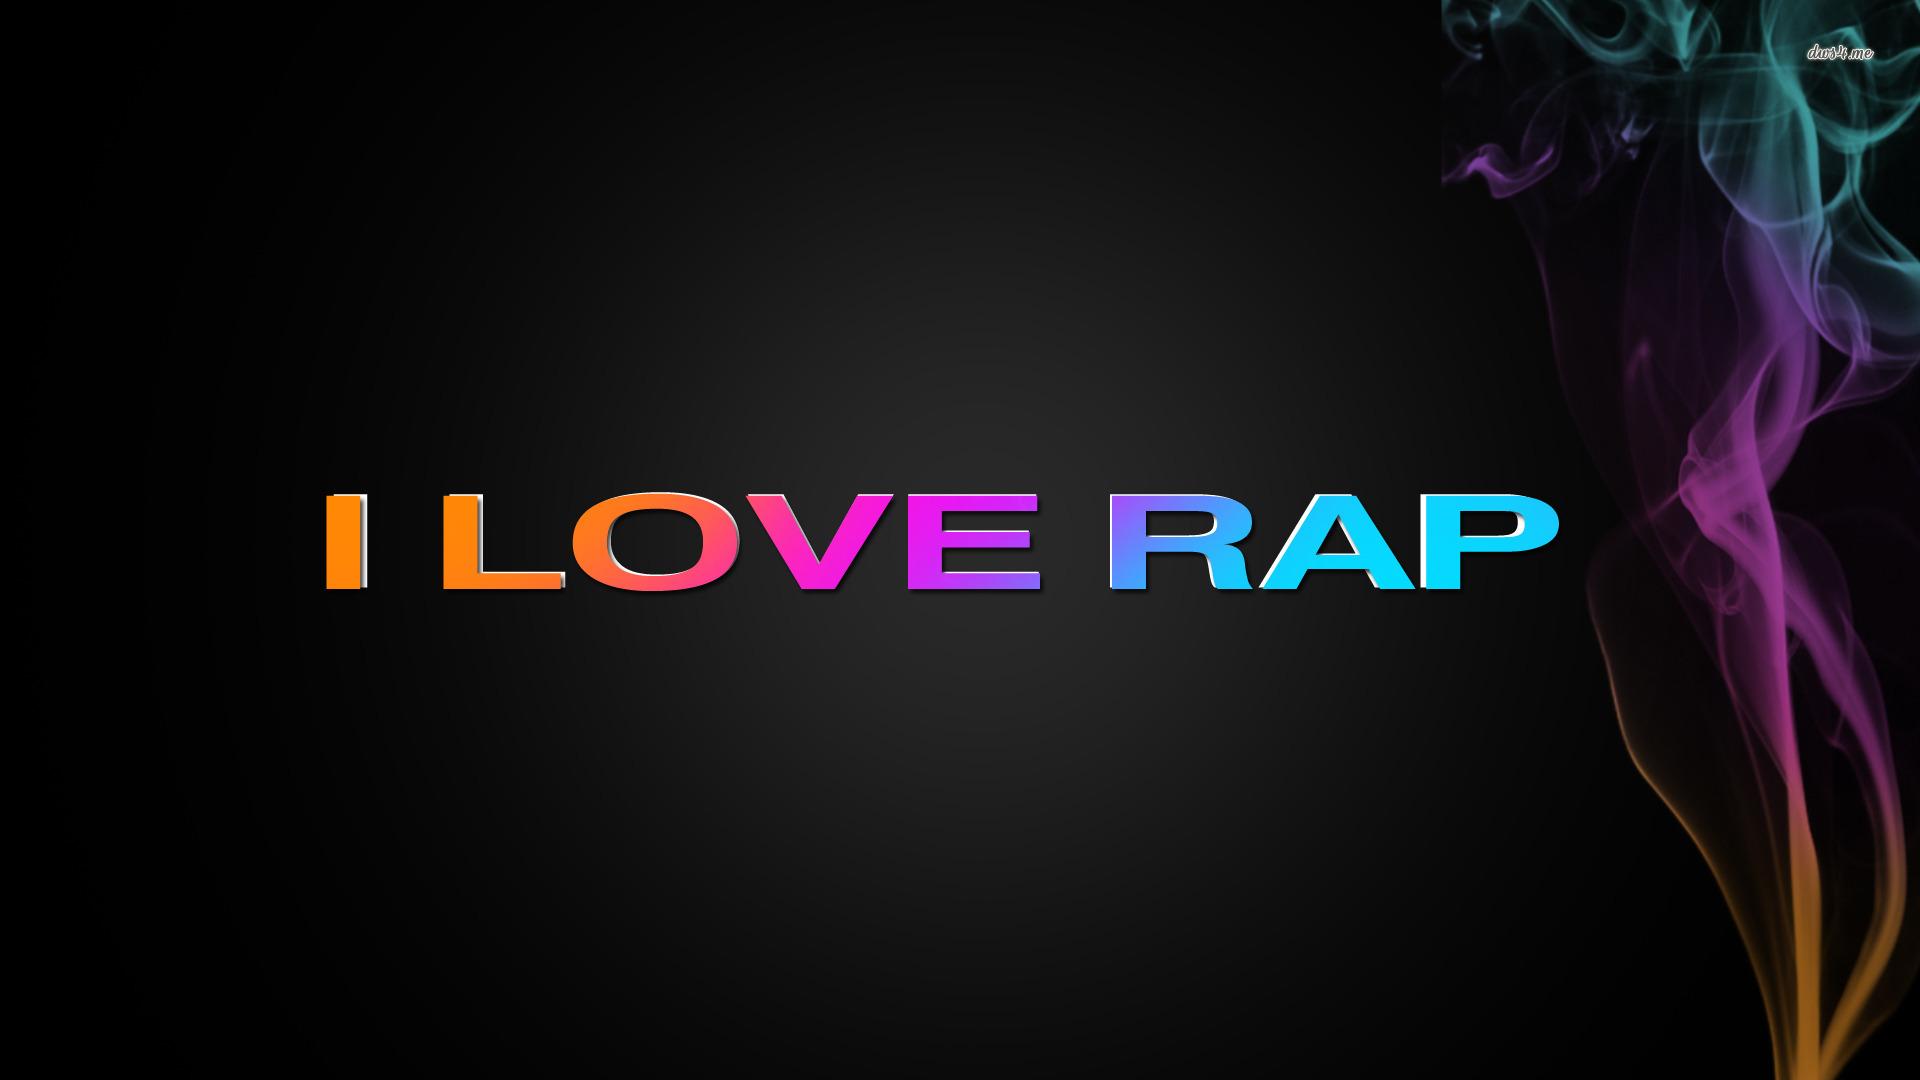 6769 i love rap 1920x1080 music wallpaperjpg 1920x1080